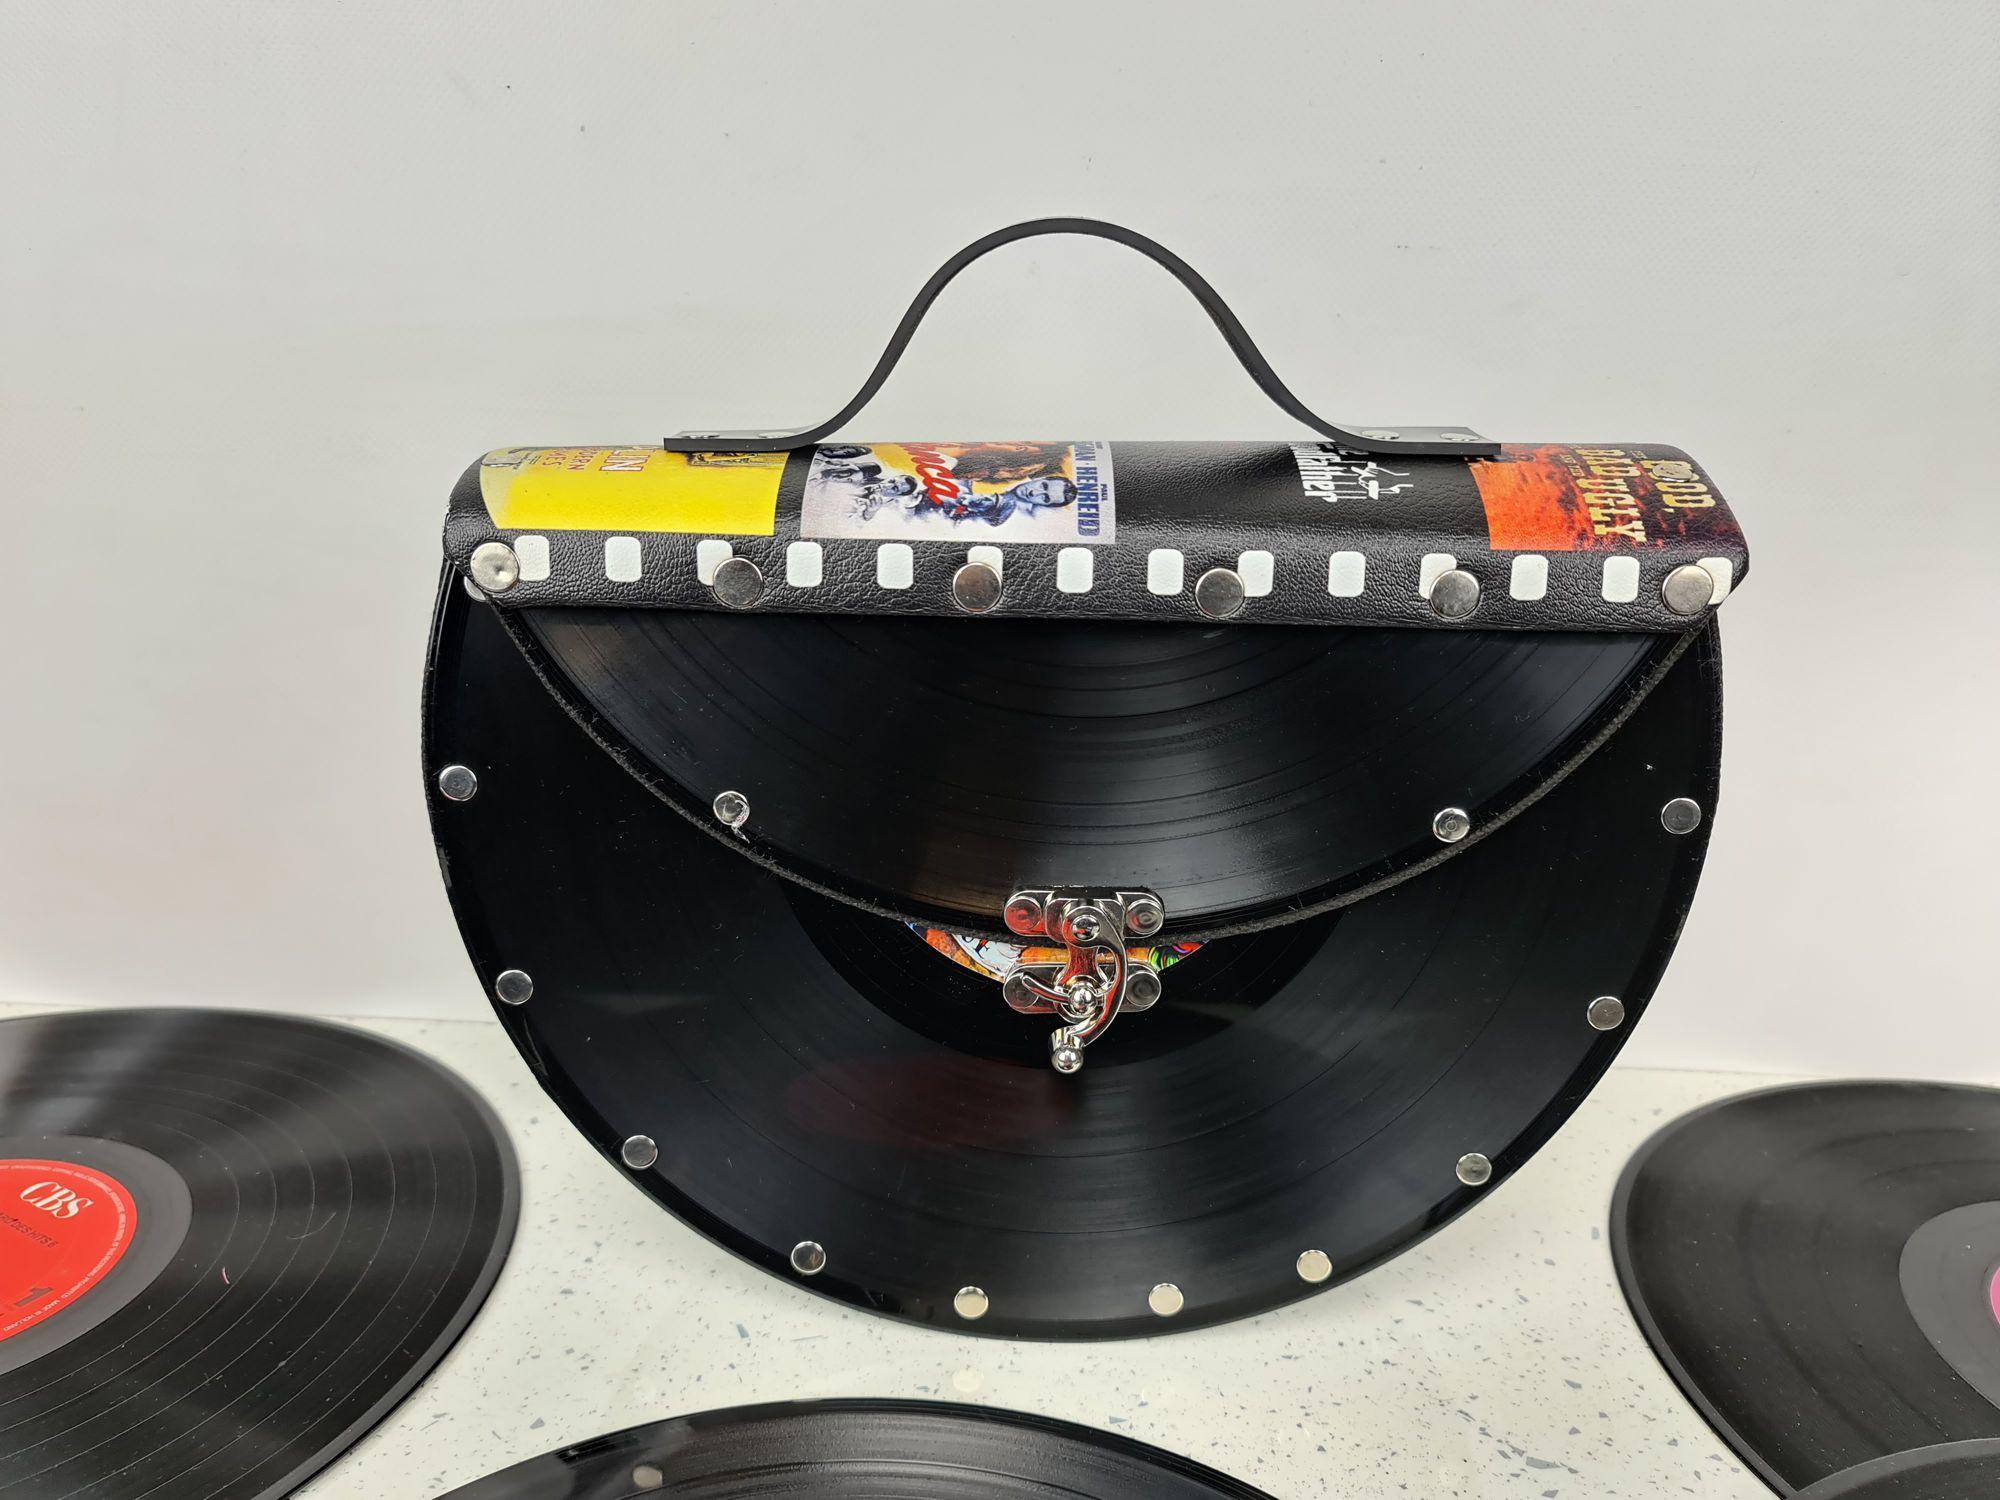 BA013_sac-a-main-pin-up-rockabilly-retro-vinyl-33t